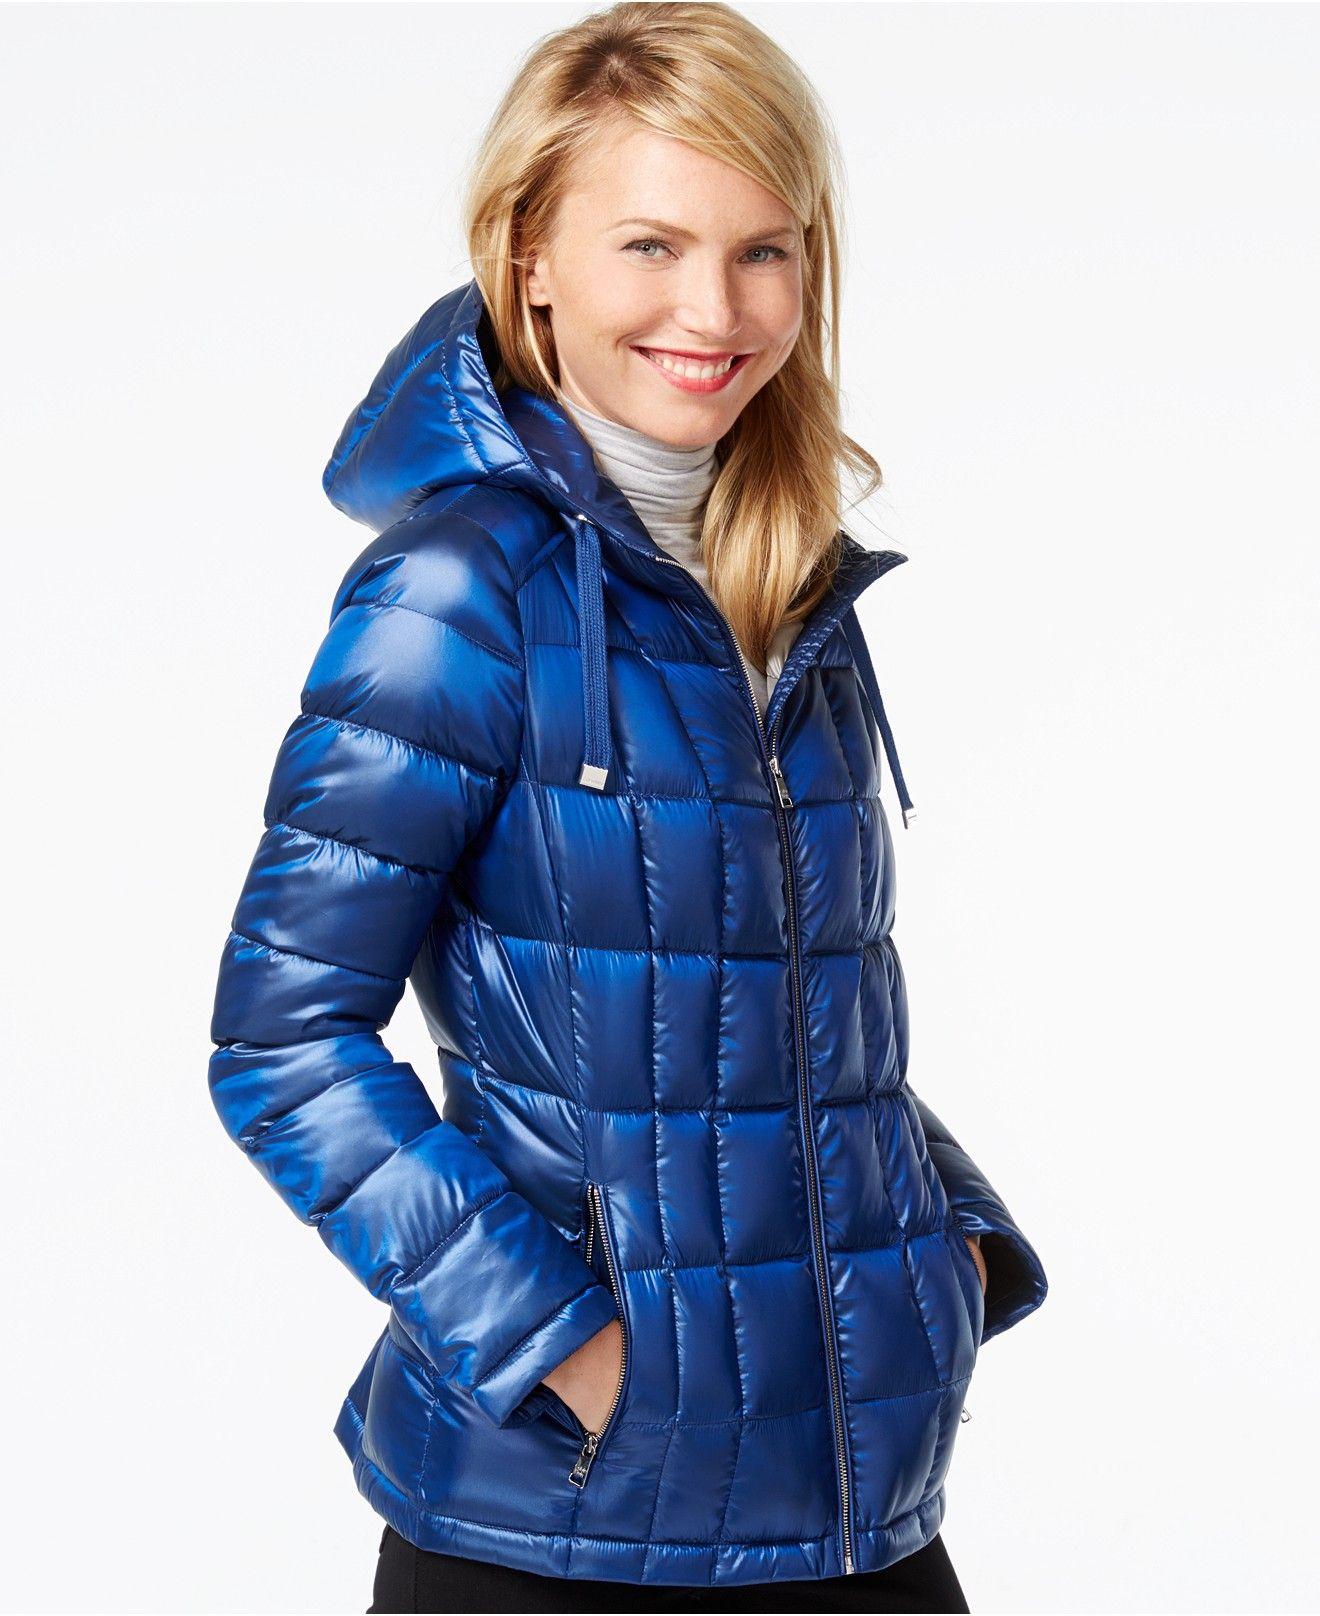 Calvin Klein Metallic Packable Down Puffer Coat Coats Women Macy S Puffer Jacket Women Down Puffer Coat Coats For Women [ 1616 x 1320 Pixel ]